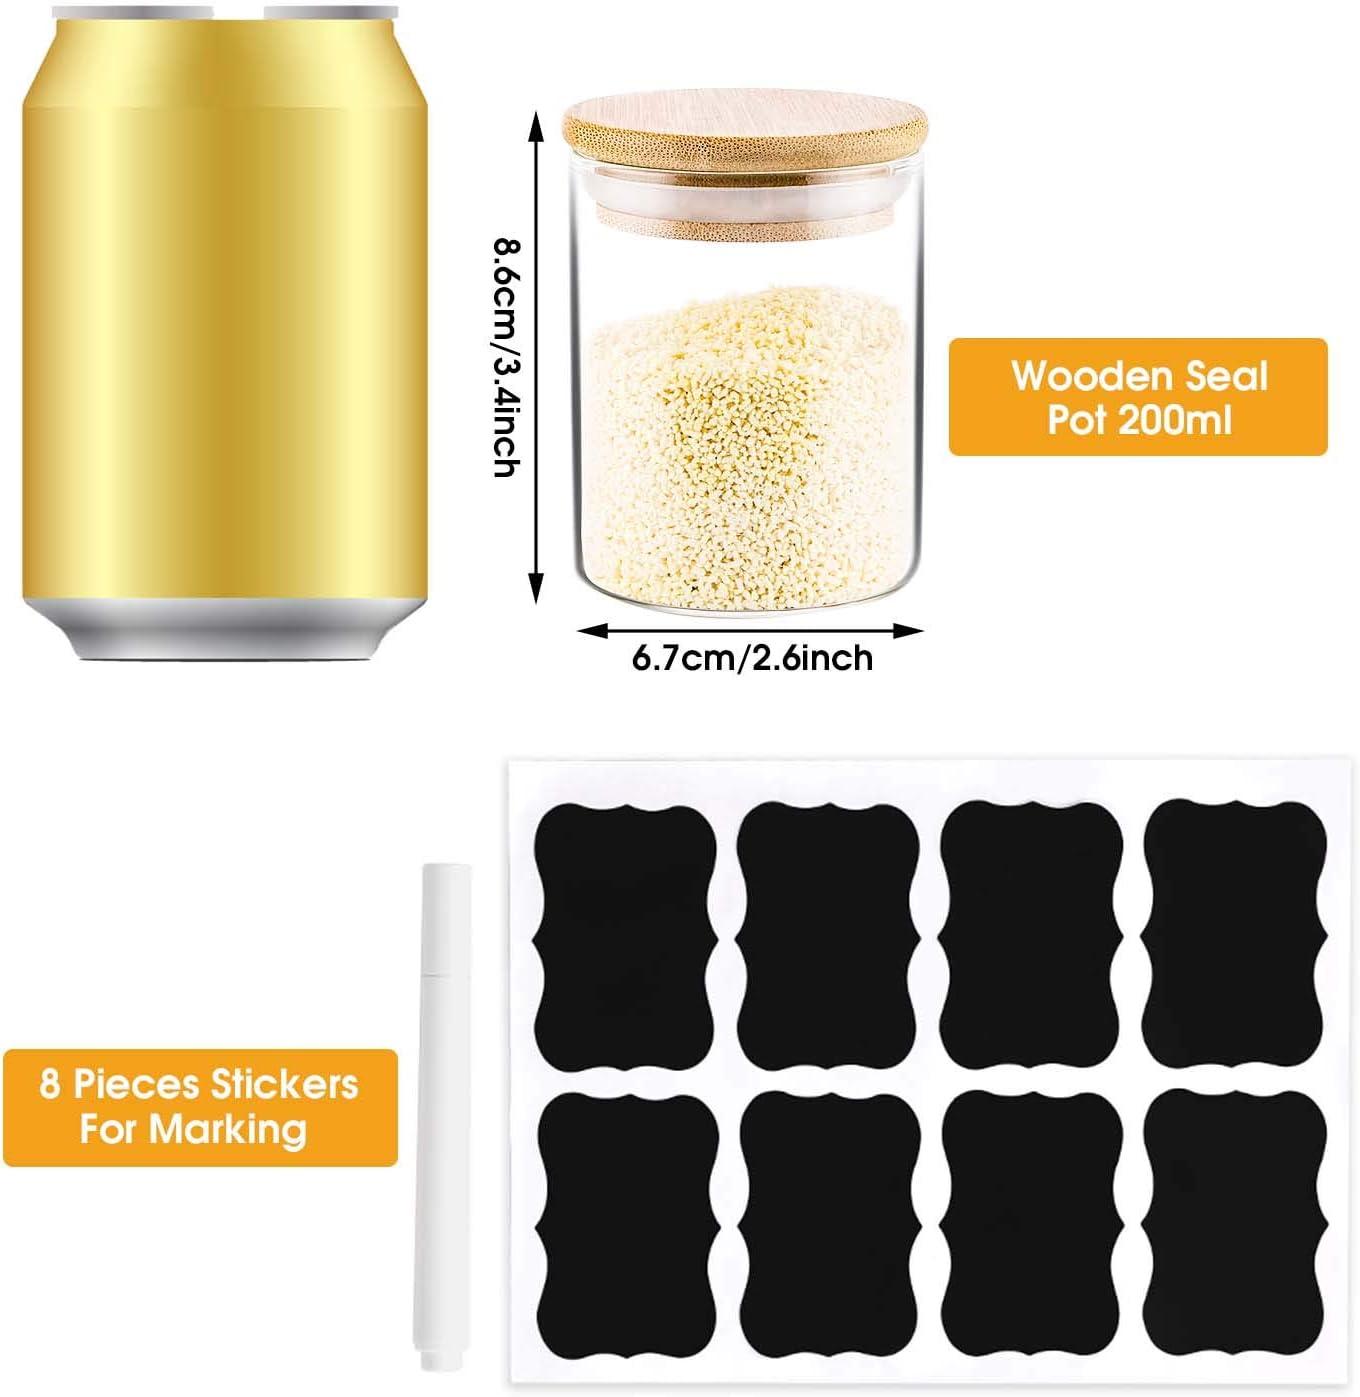 Cocina Bote de Especias Contenedores para Comida T/é /& Az/úcar 7.5oz Peque/ños Cristal Frascos de Especias con Tapas de Bamb/ú 12Pcs Hermetico Tarro de Vidrio de Almacenamiento